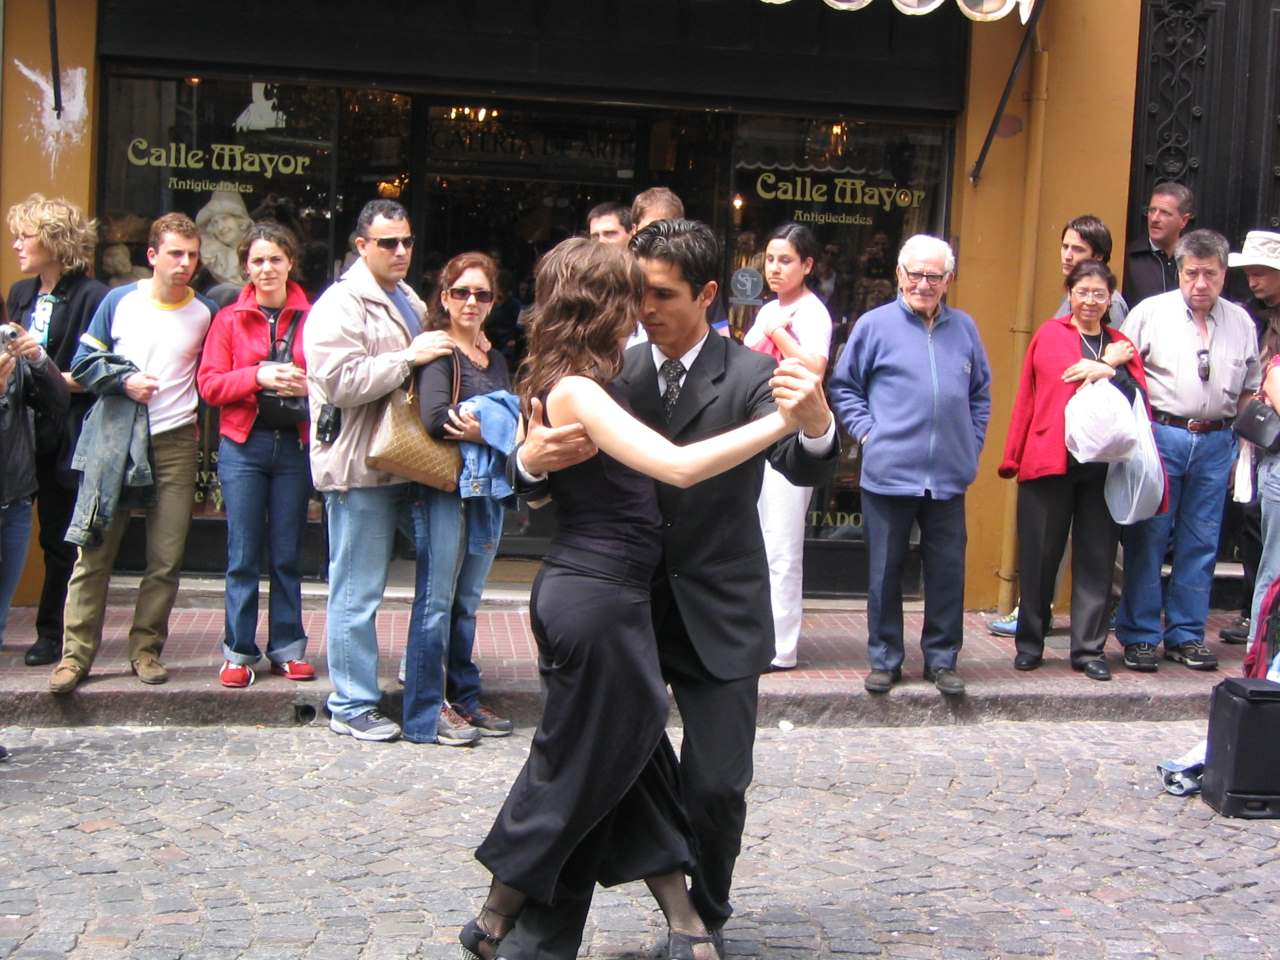 Argentine Tango - cultural dances